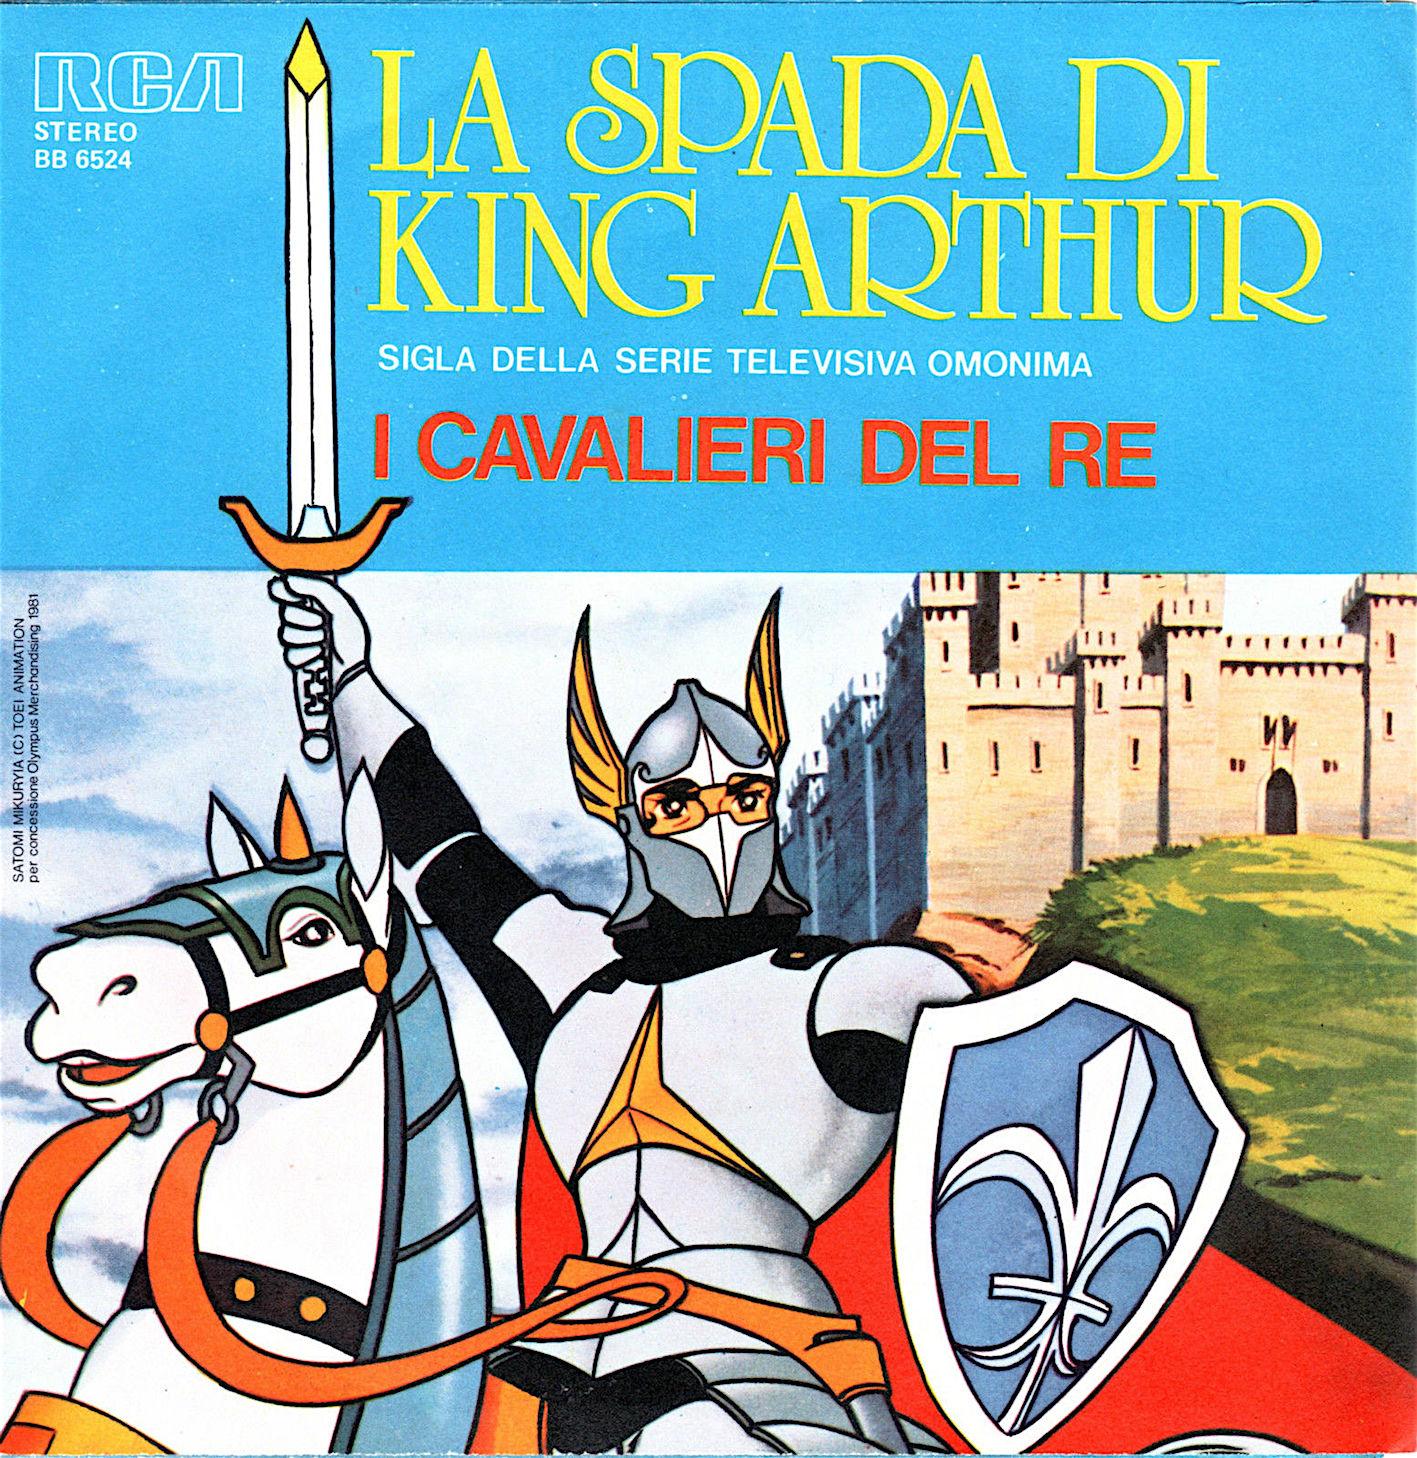 La spada di king arthur anime molto amato primi